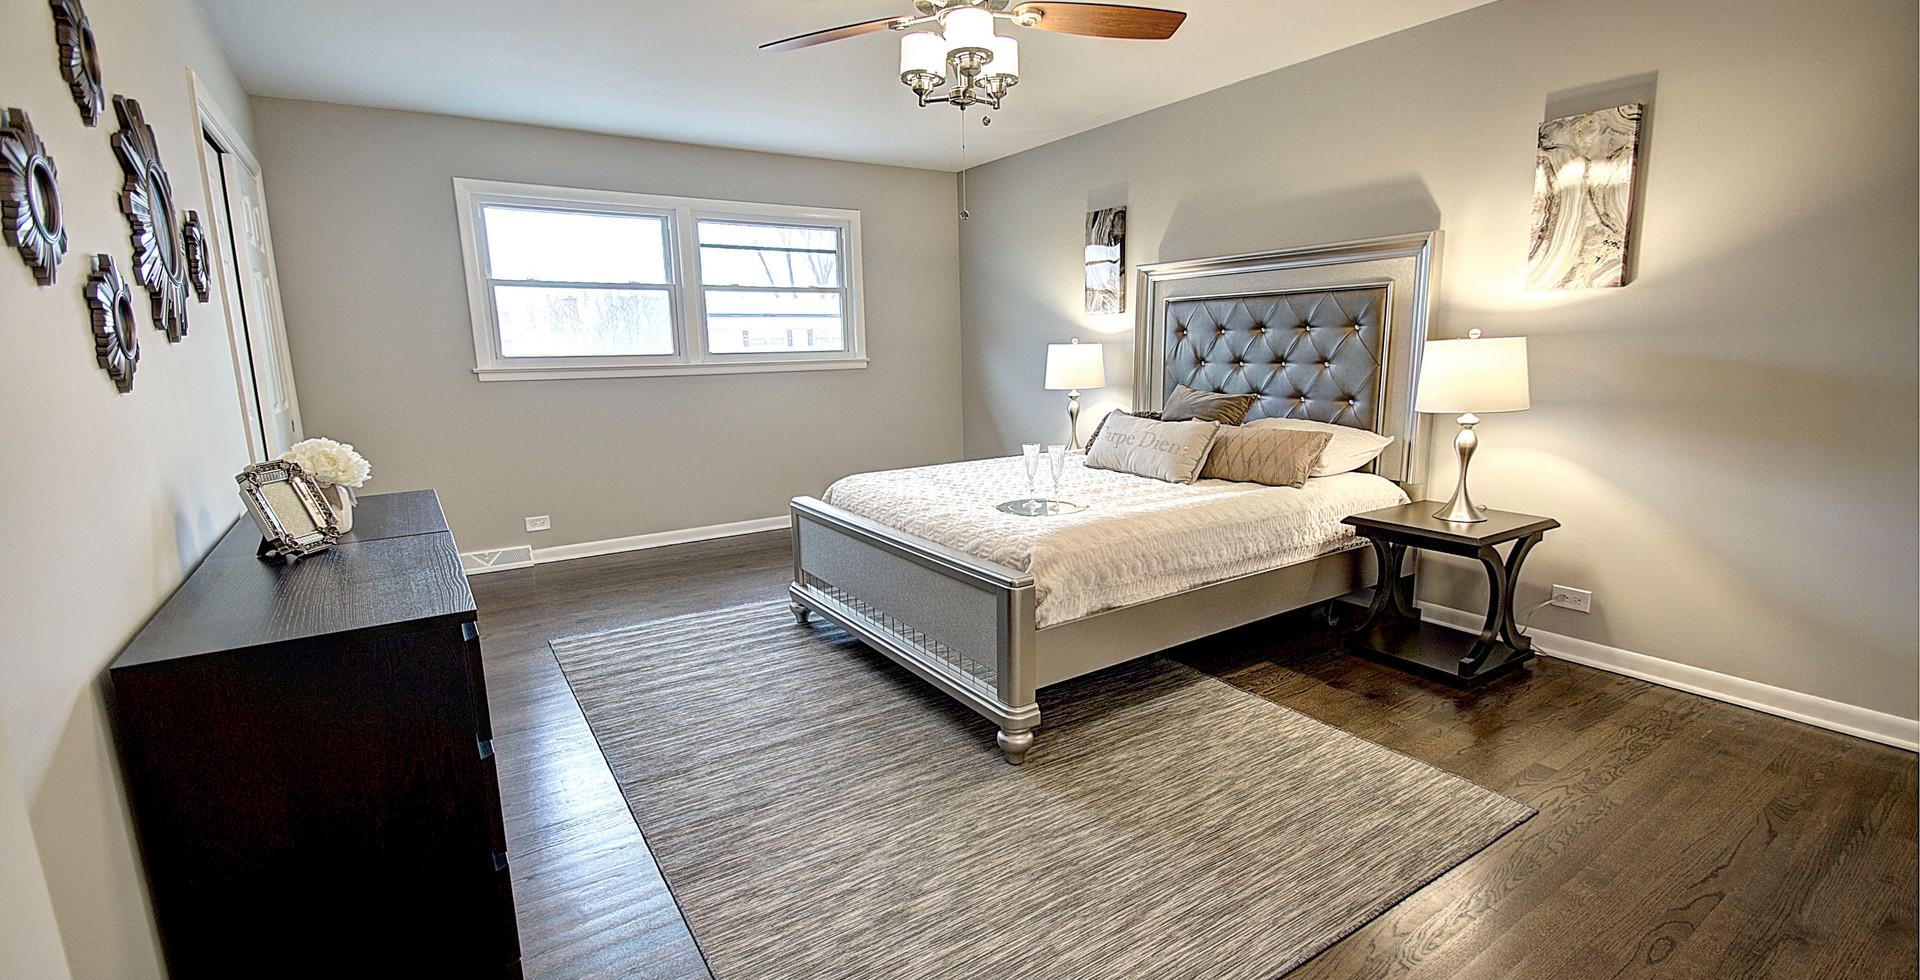 Bedroom in Bolingbrook designed by MRM Home Design.jpg